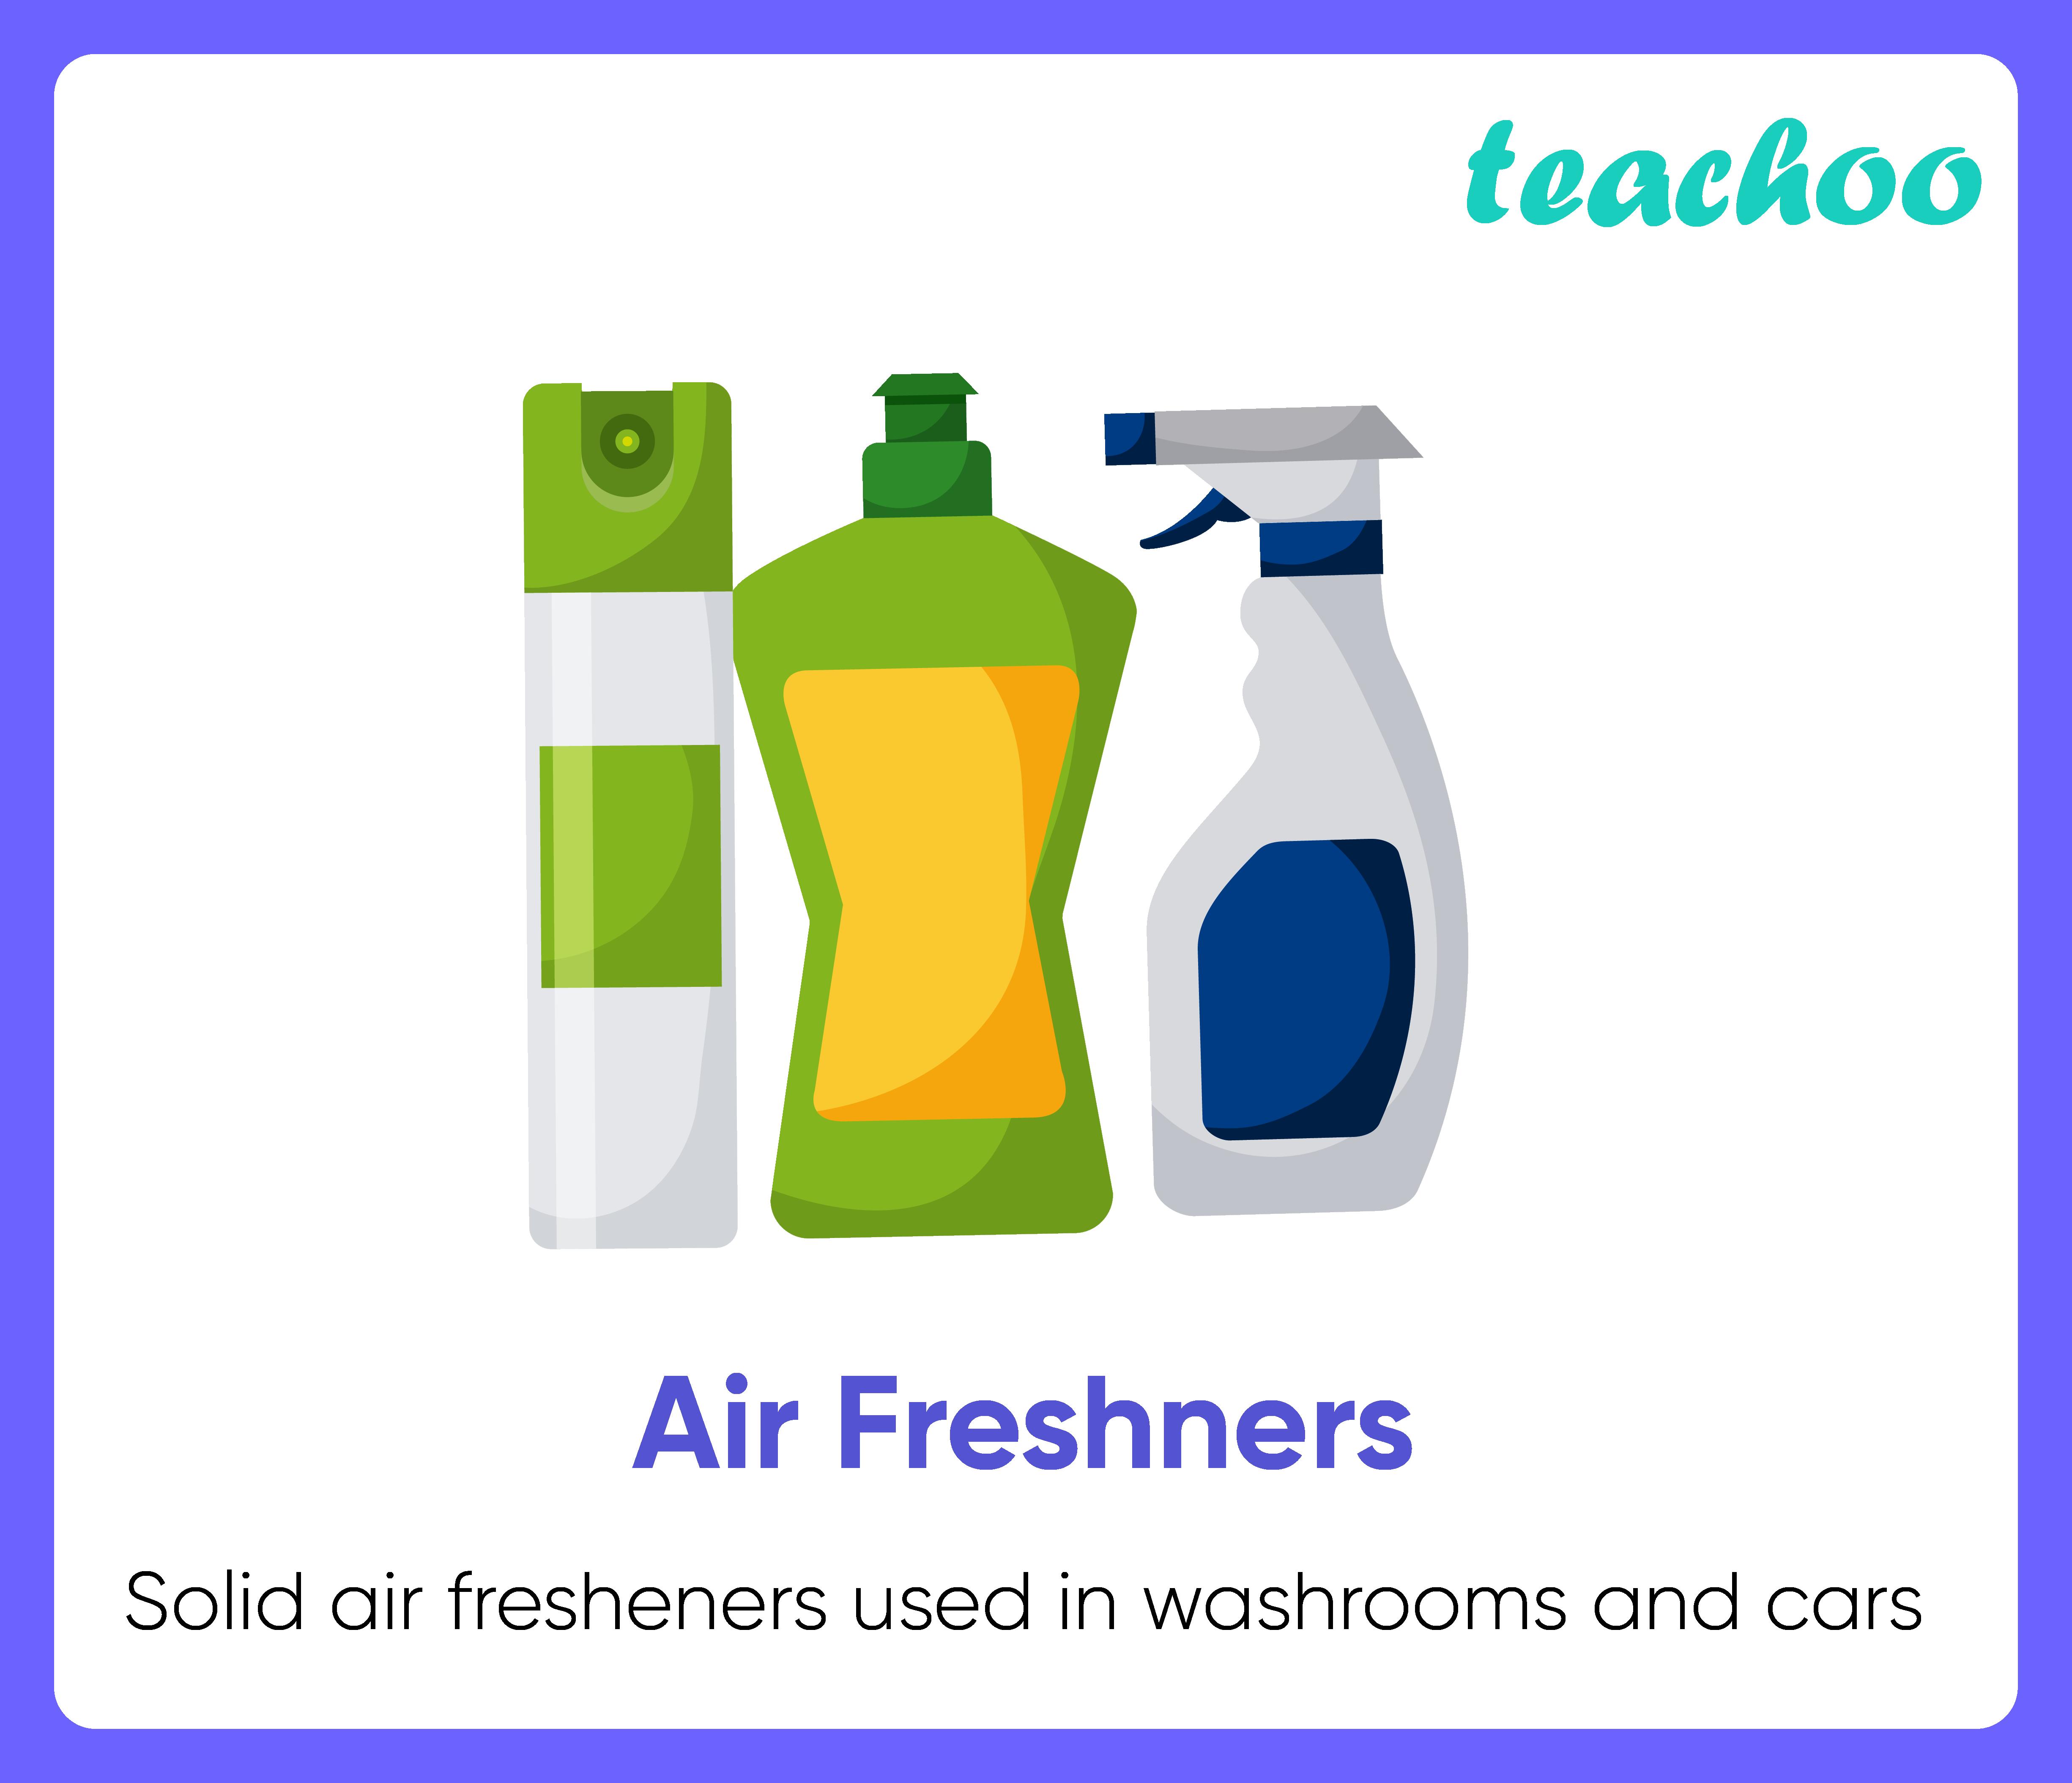 Air Freshner-Teachoo-01.png